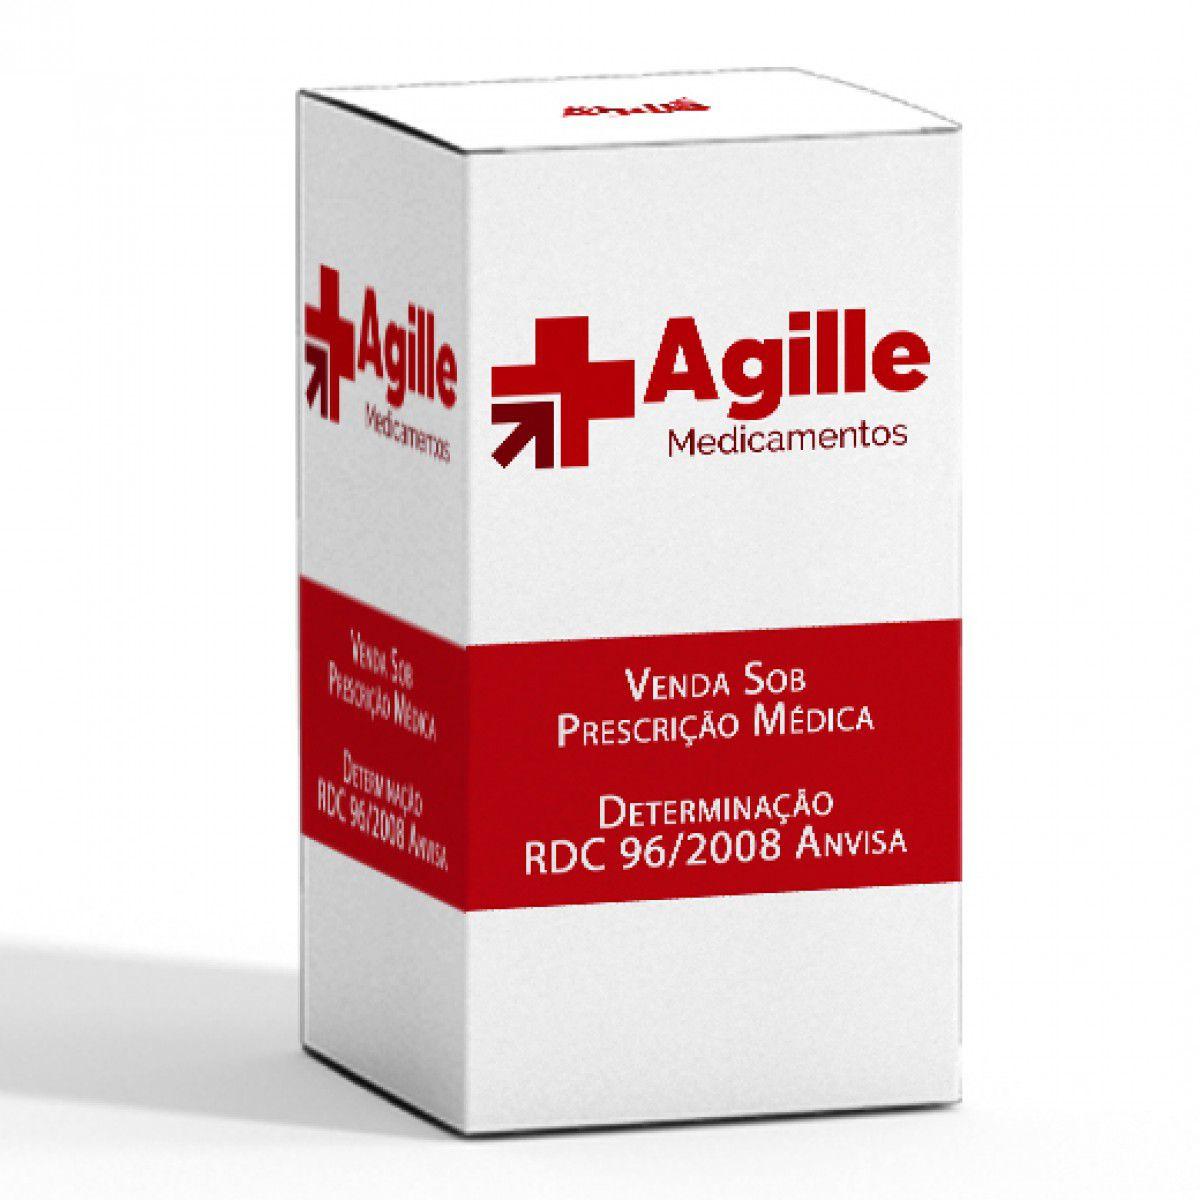 GRANULOKINE 60MU/ML SOL INJ C/01 SP X 0,5ML (FILGR  - Agille Speciality